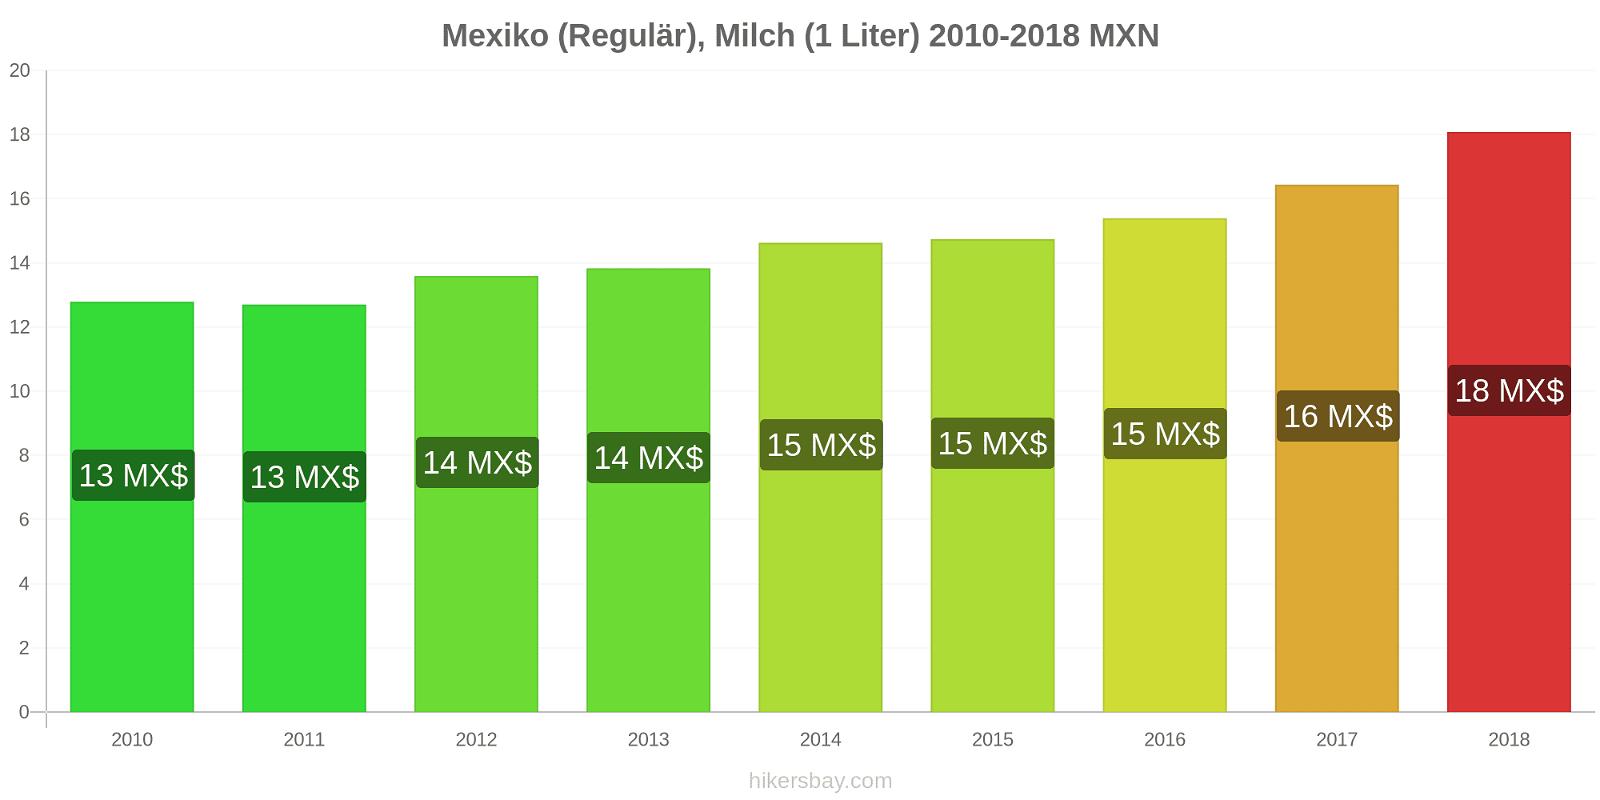 Mexiko Preisänderungen (Regulär), Milch (1 Liter) hikersbay.com